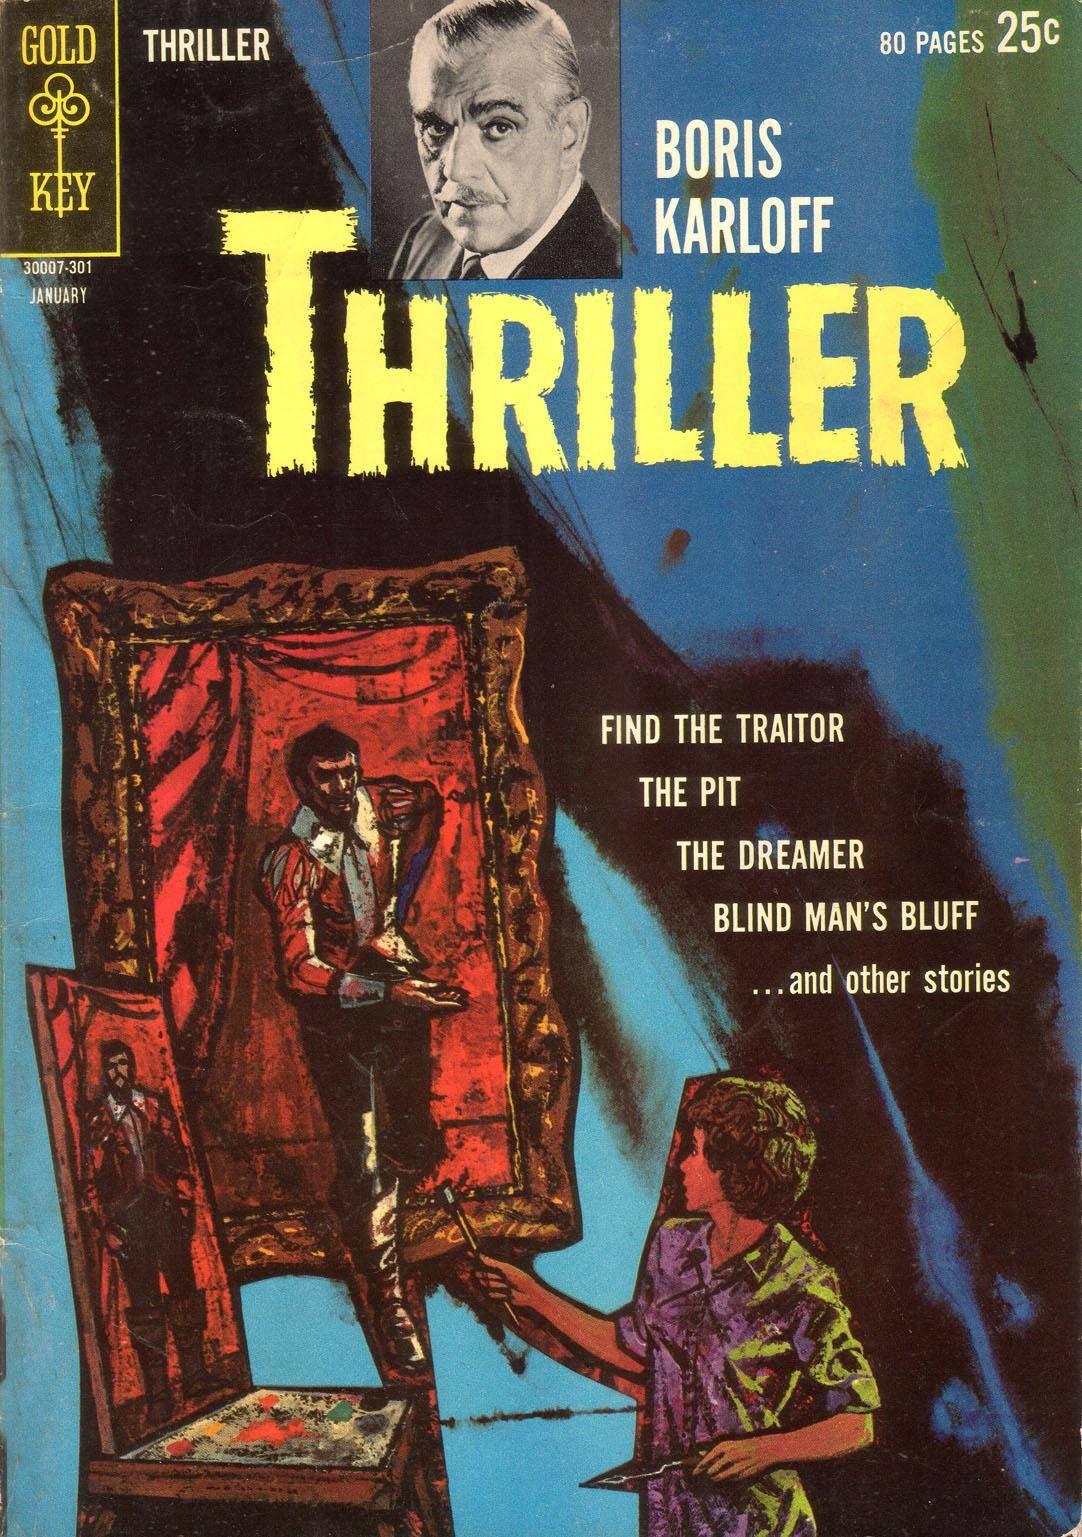 Boris Karloff - Thriller 002 1963